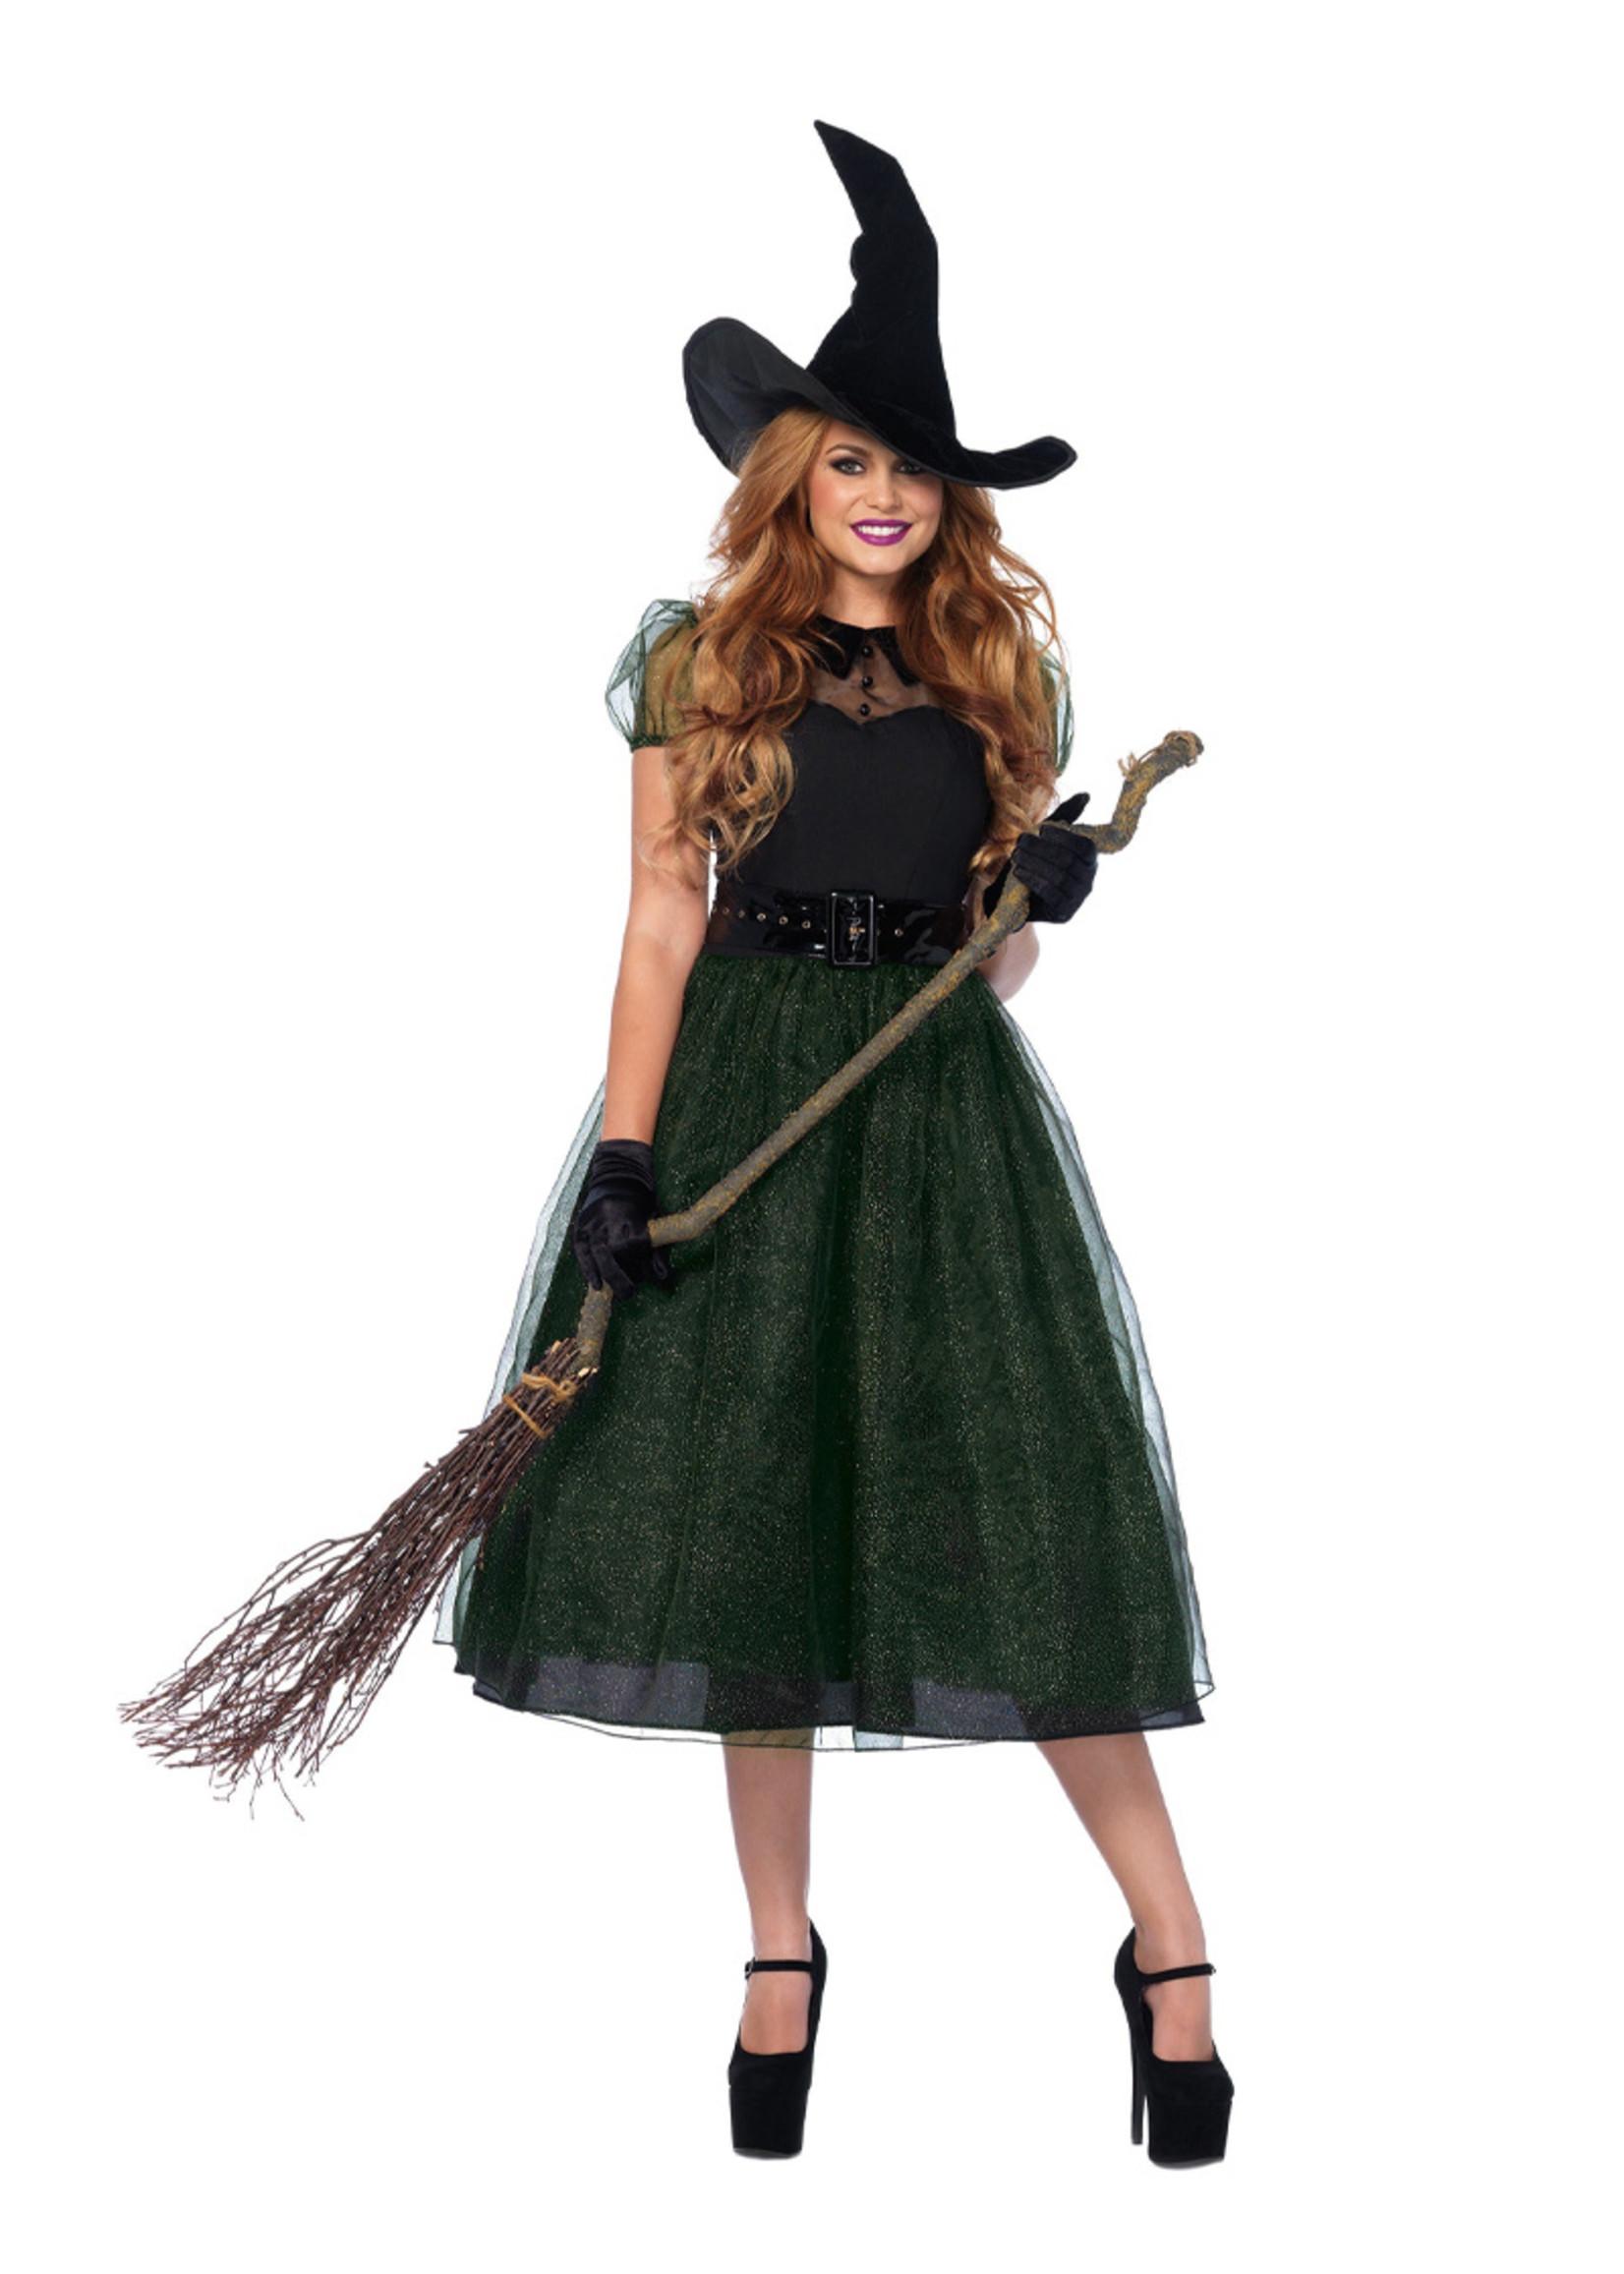 Darling Spellcaster Costume - Women's